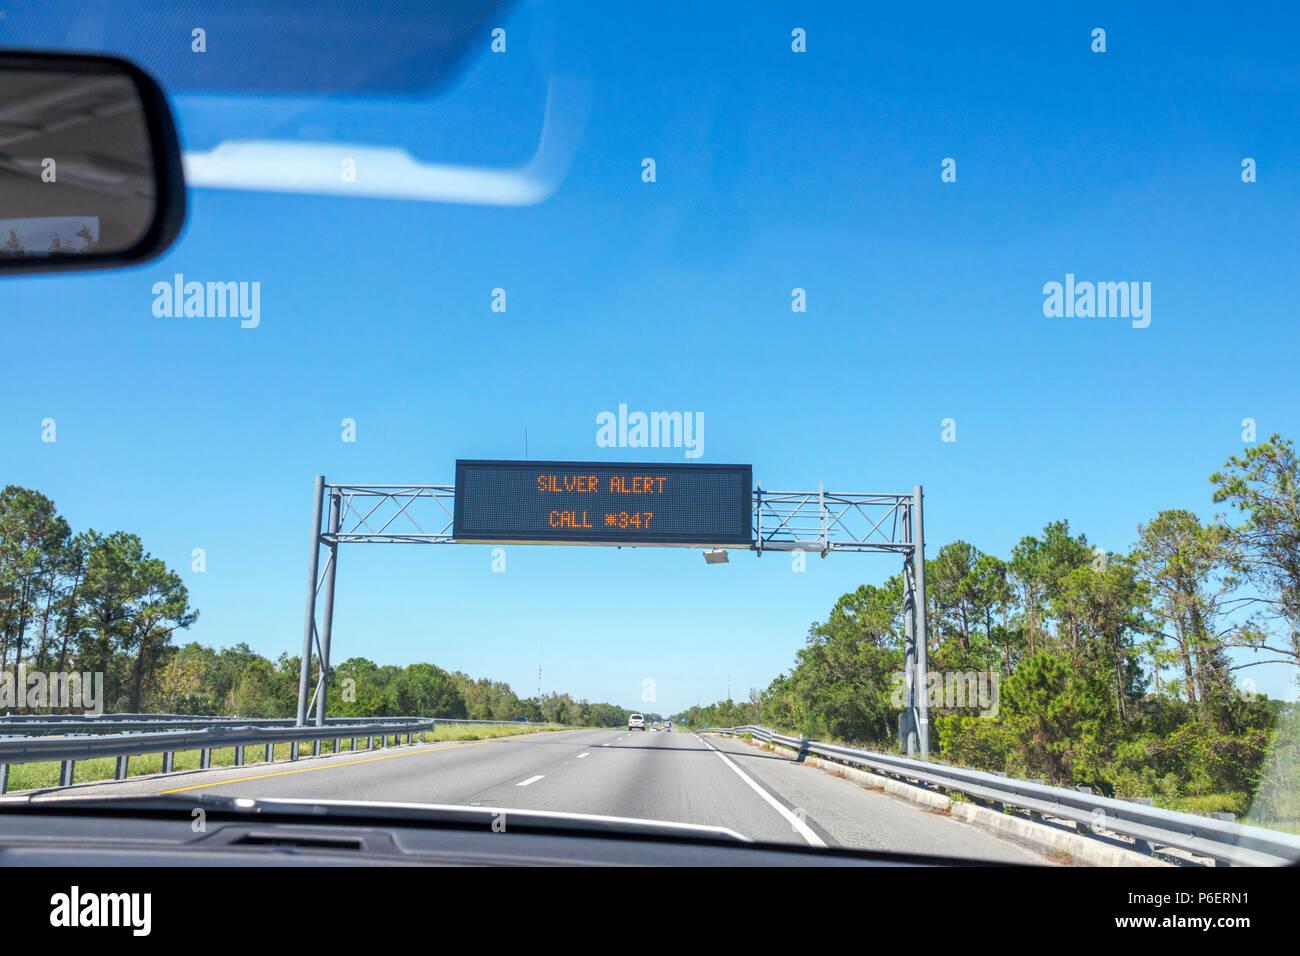 Fort Ft. Pierce Florida Florida Turnpike Toll Road elektronische Nachricht signieren Board Silber alert fehlende Senioren Fahrer Stockbild